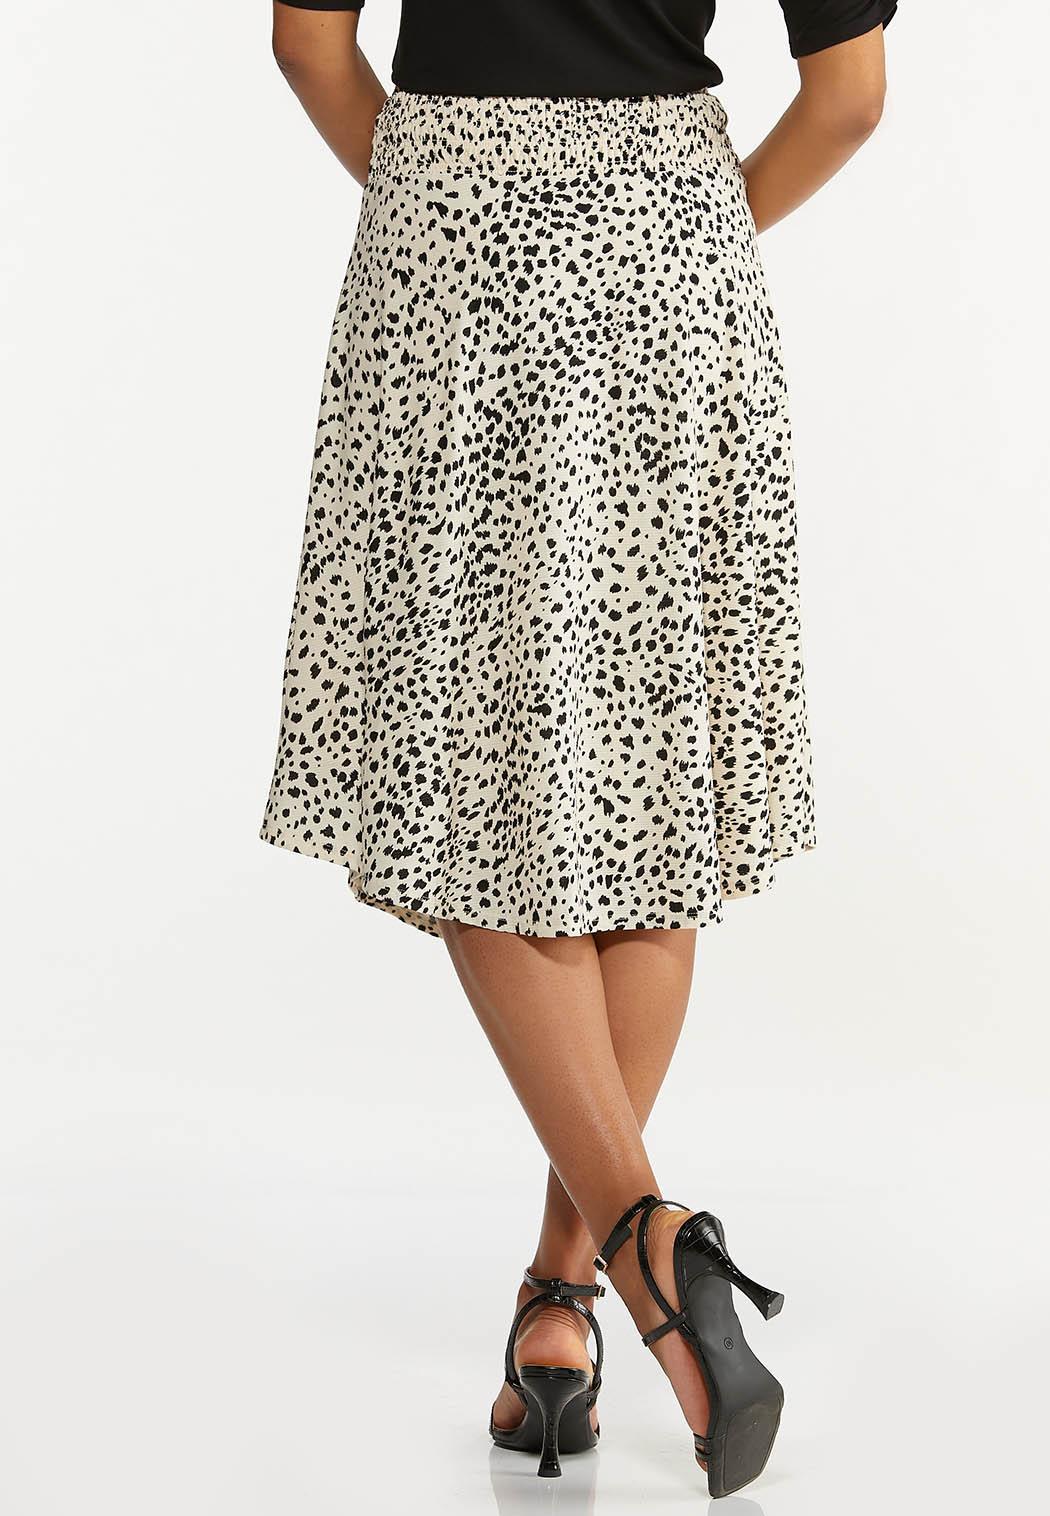 Plus Size Textured Animal Print Skirt (Item #44618588)